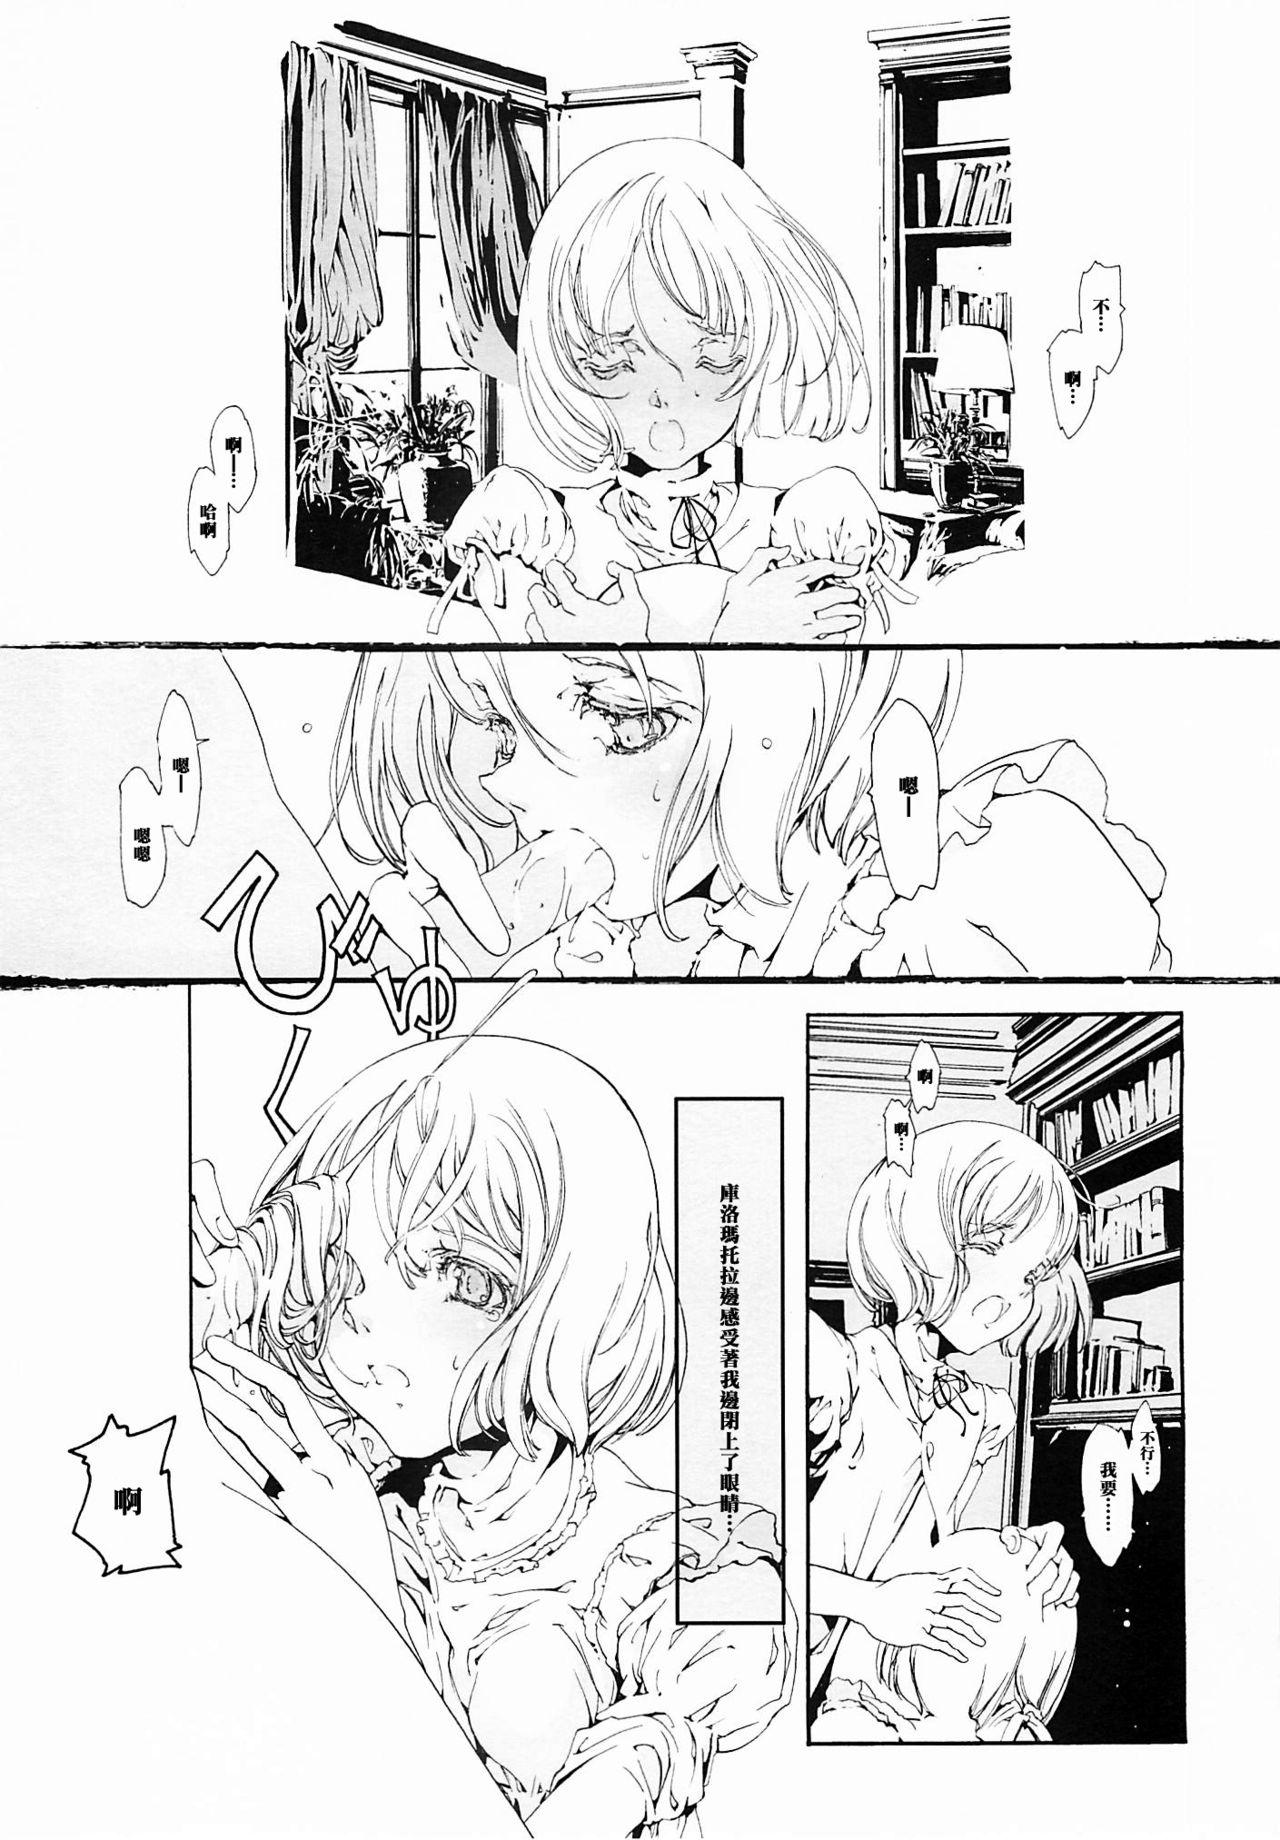 (CR37) [70 Nenshiki Yuukyuu Kikan (Endou Okito)] ORGAN-Tino  01-02[Chinese] [拾荒者汉化组] [Incomplete] 82